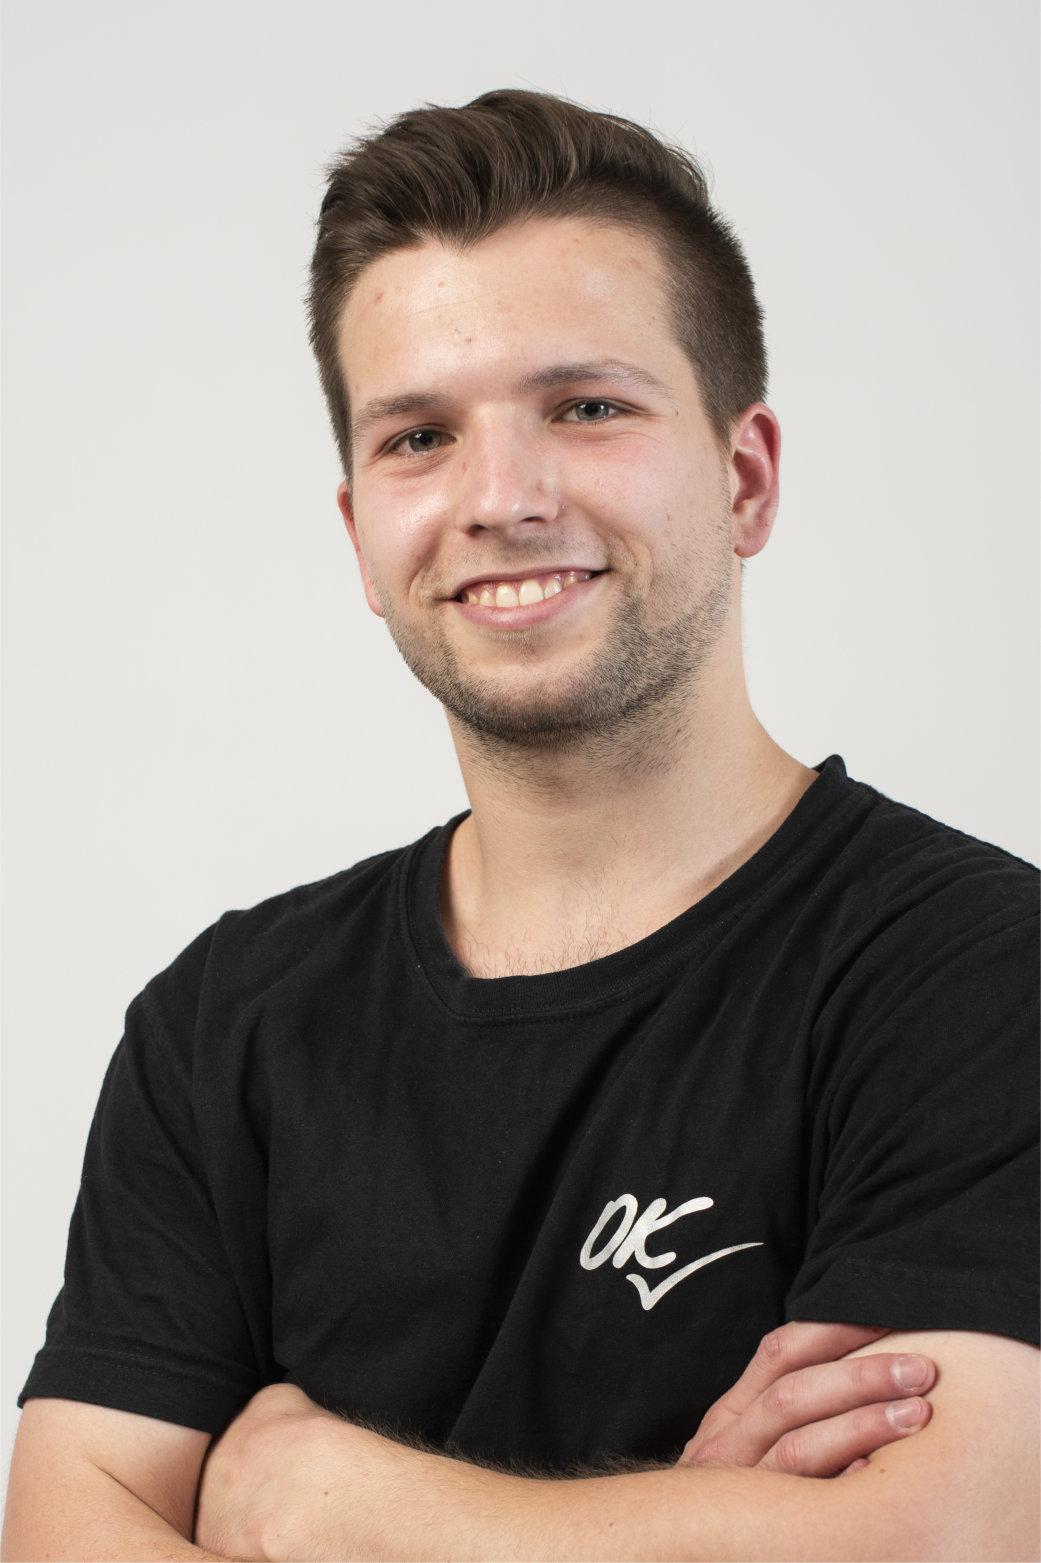 Kirschner Simon